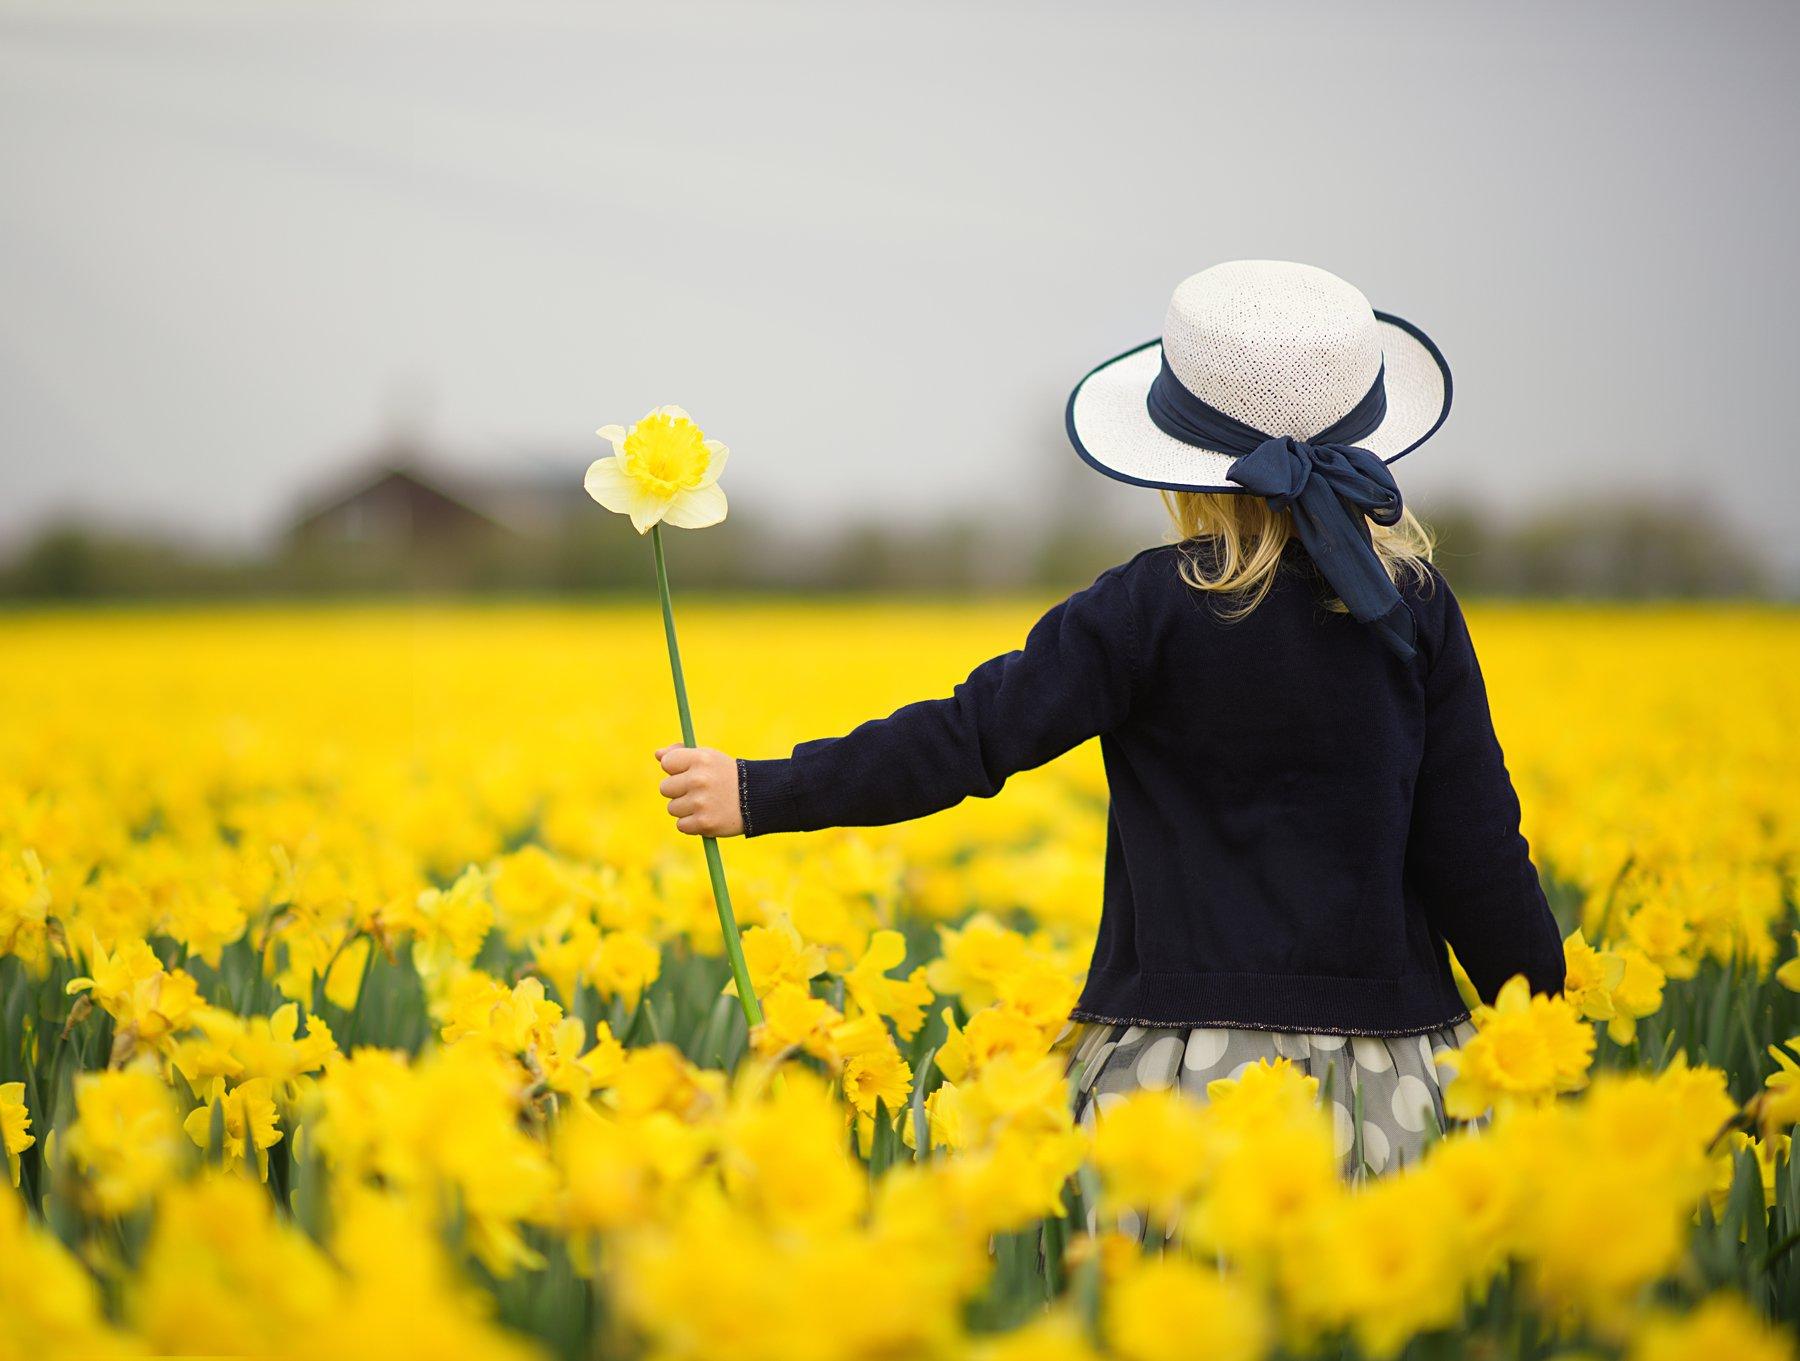 spring нарциссы голландия поле цветов весна frühling holland blumen, Elena Hildbrand